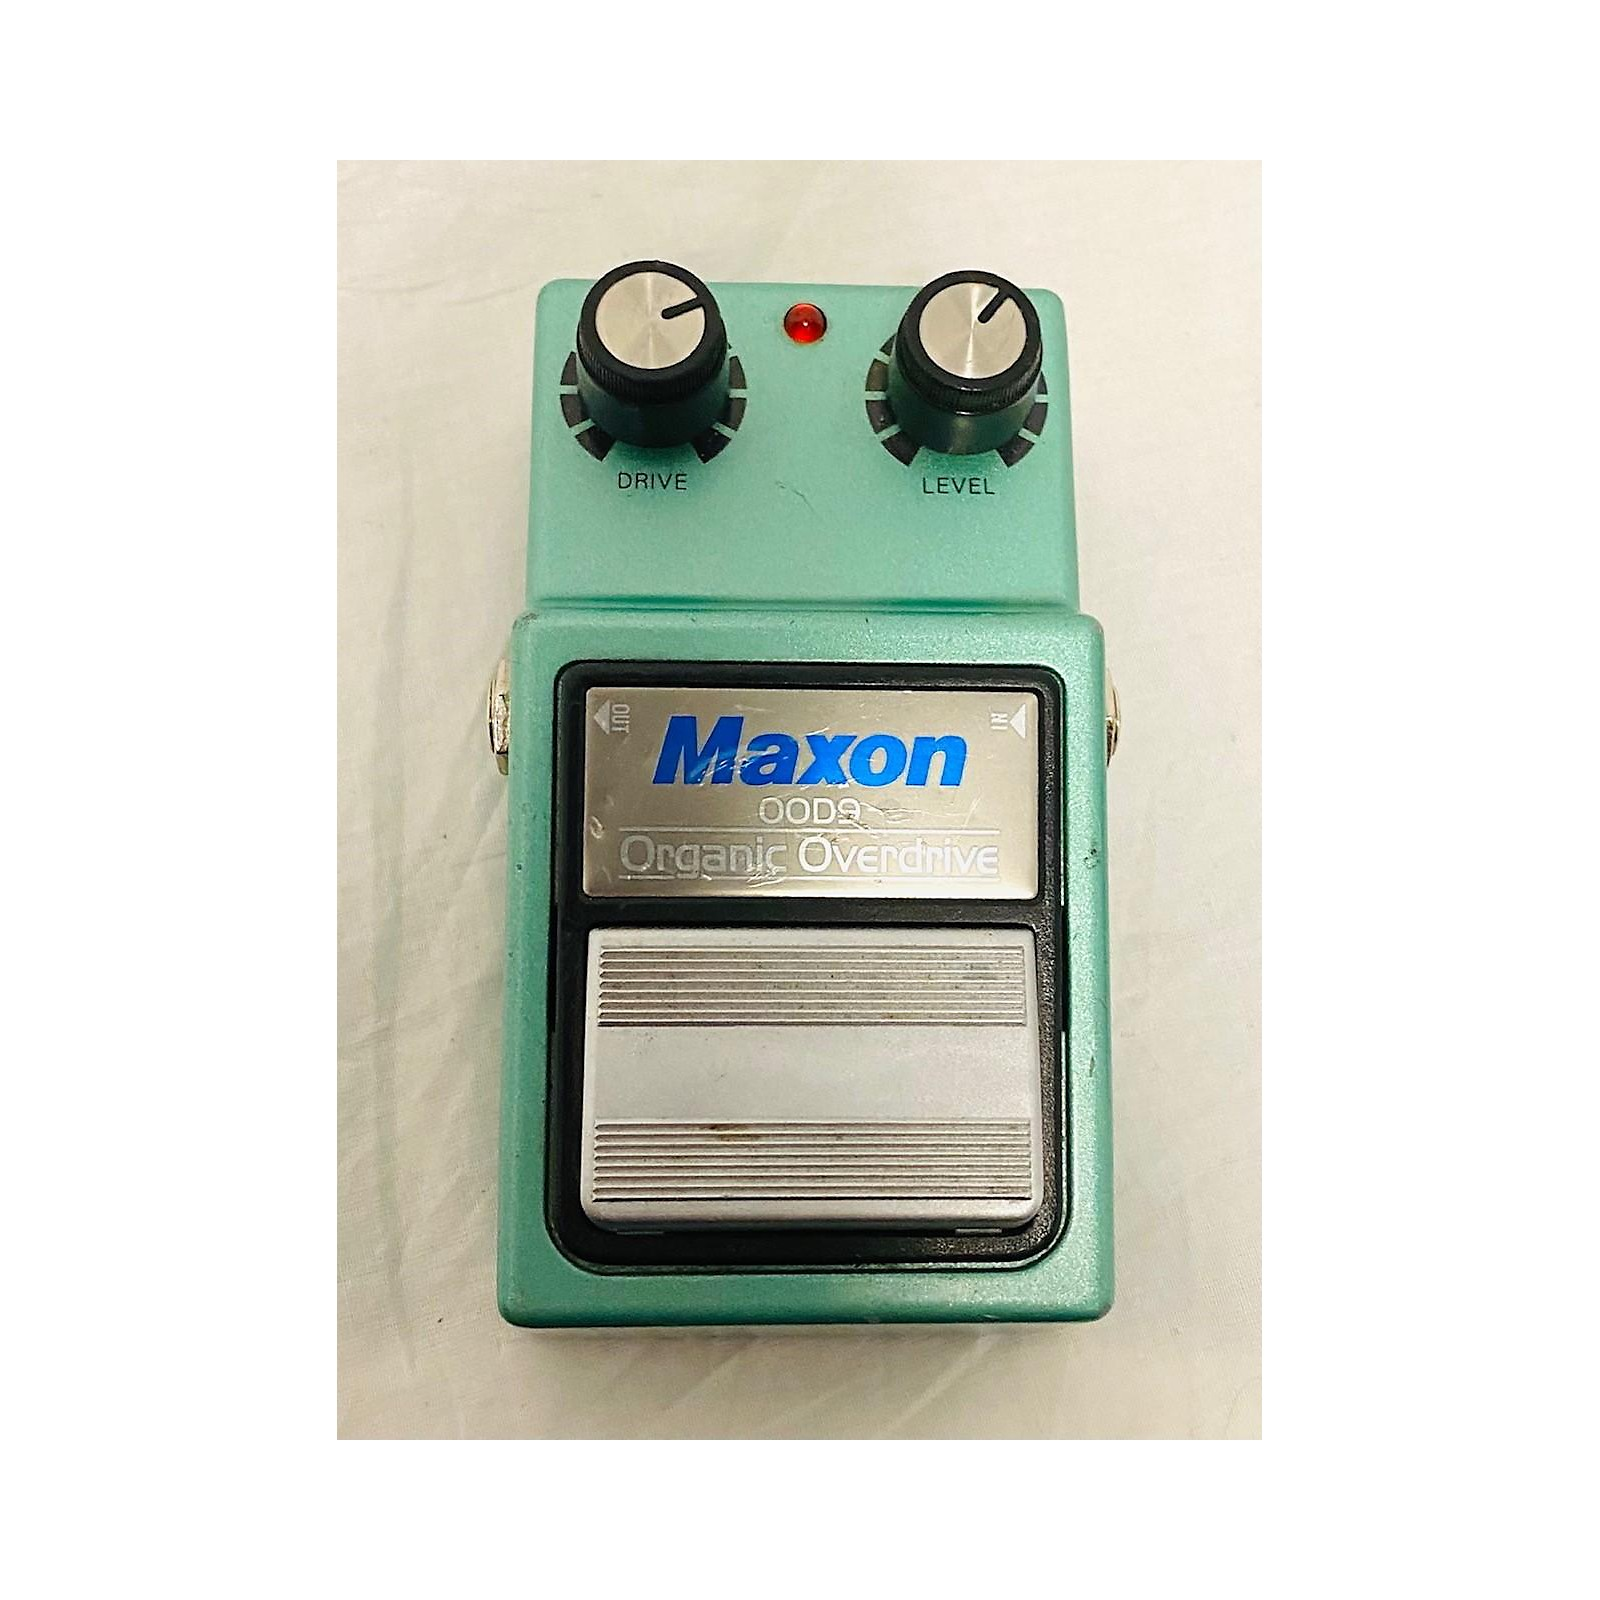 Maxon OOD9 Organic Overdrive Effect Pedal